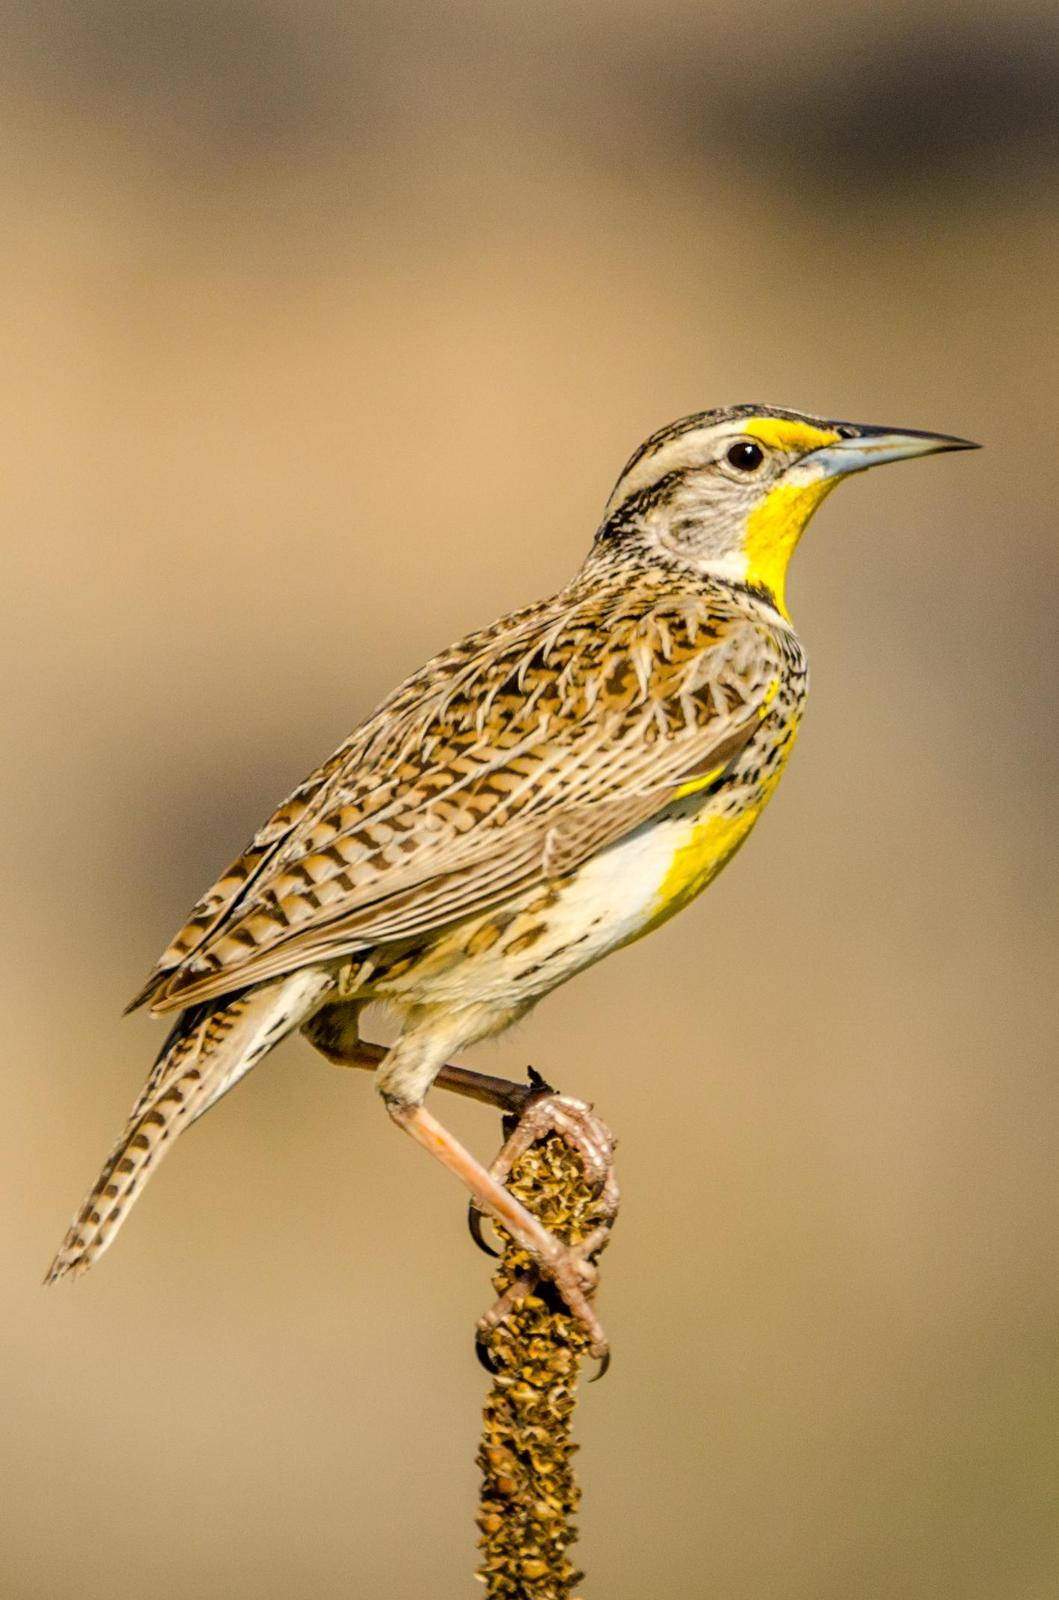 Western Meadowlark Photo by Scott Yerges